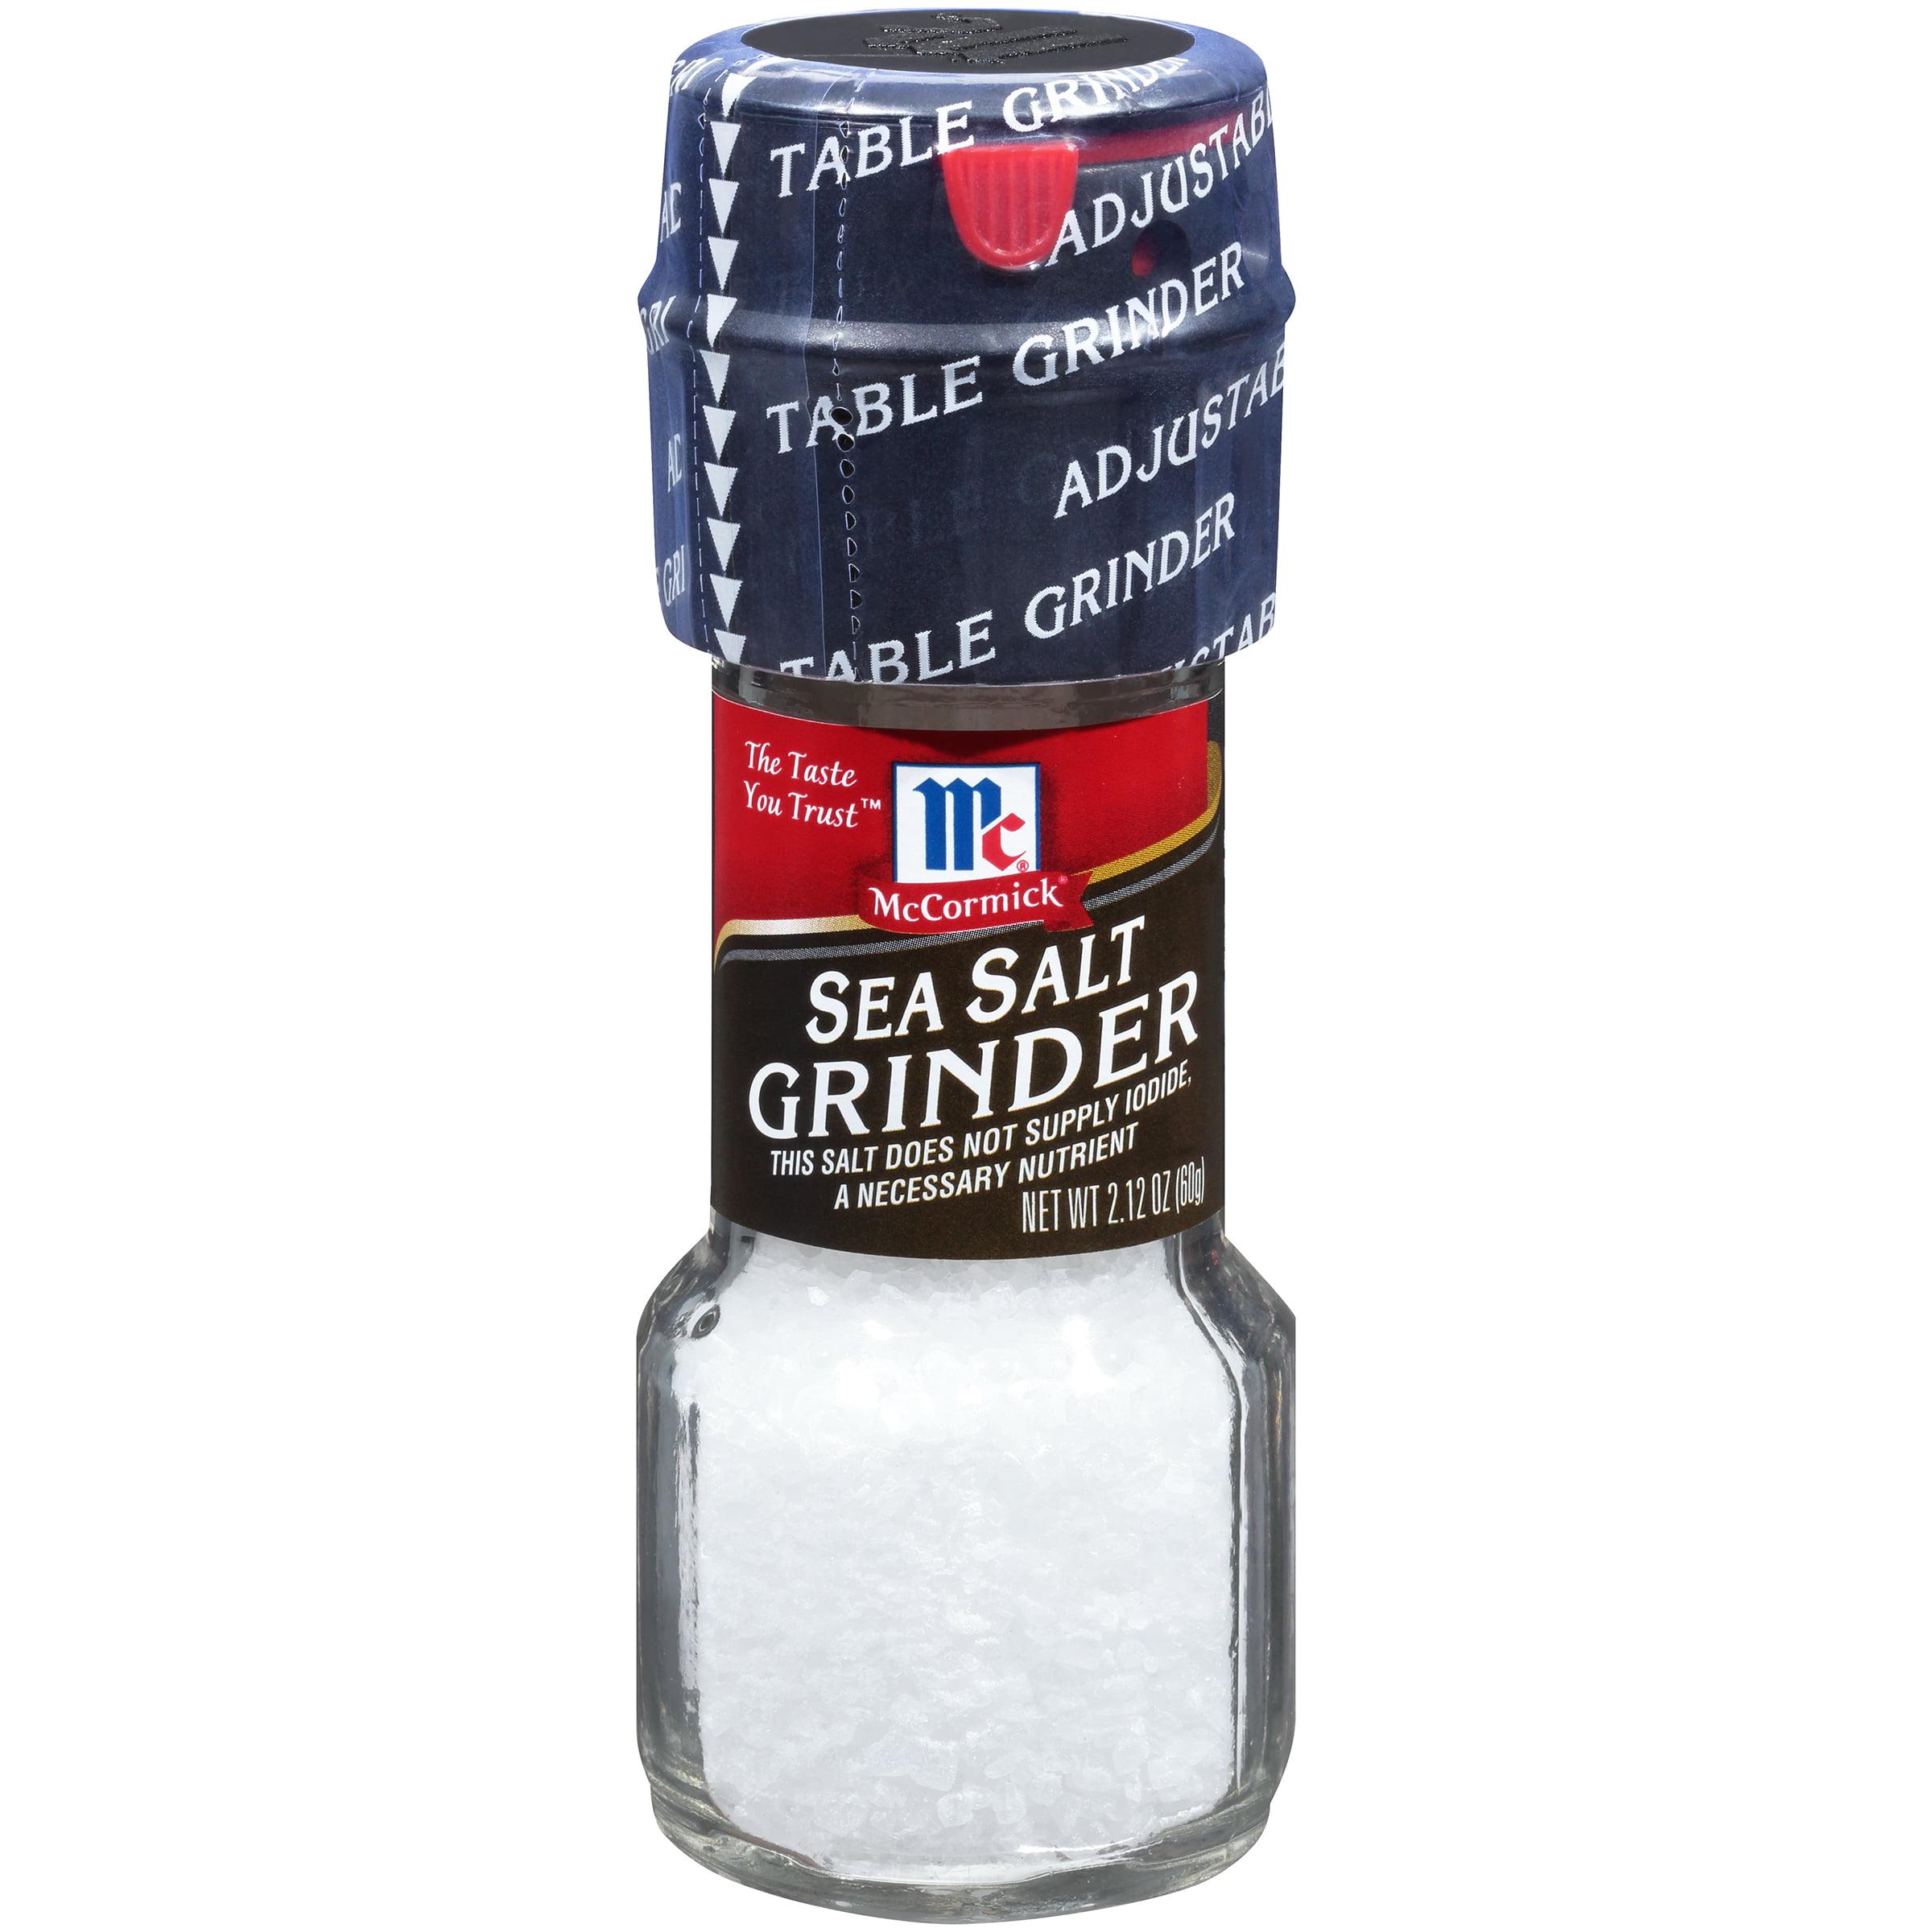 McCormick Sea Salt Grinder, 2.12 oz